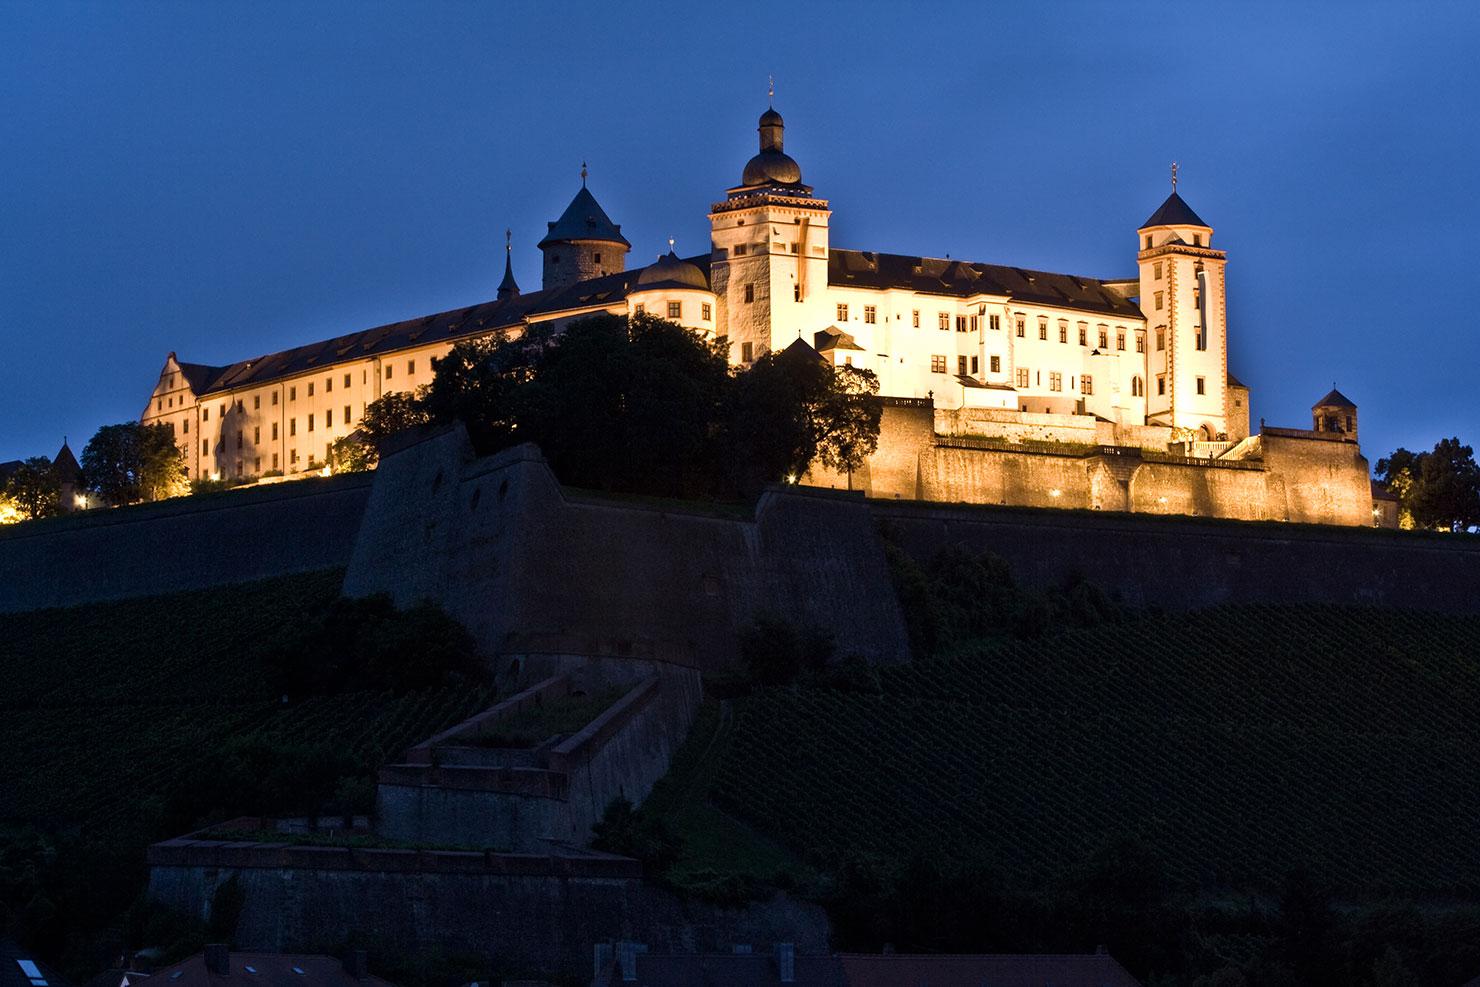 Festung Marienberg Würzburg bei Nacht